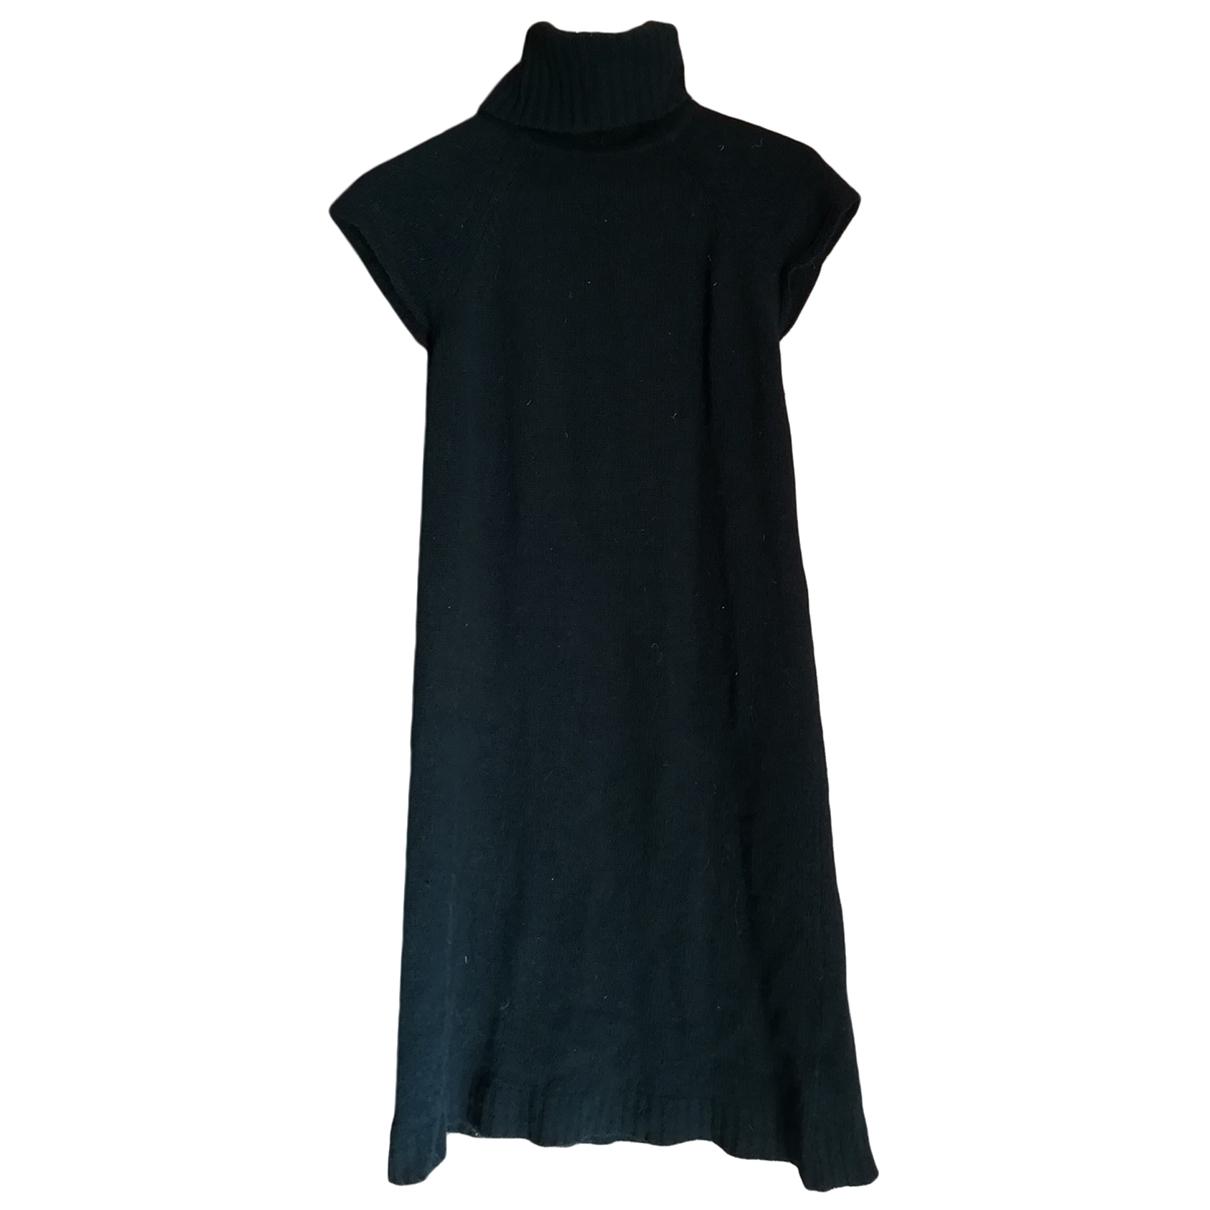 Zara - Robe   pour femme en laine - noir